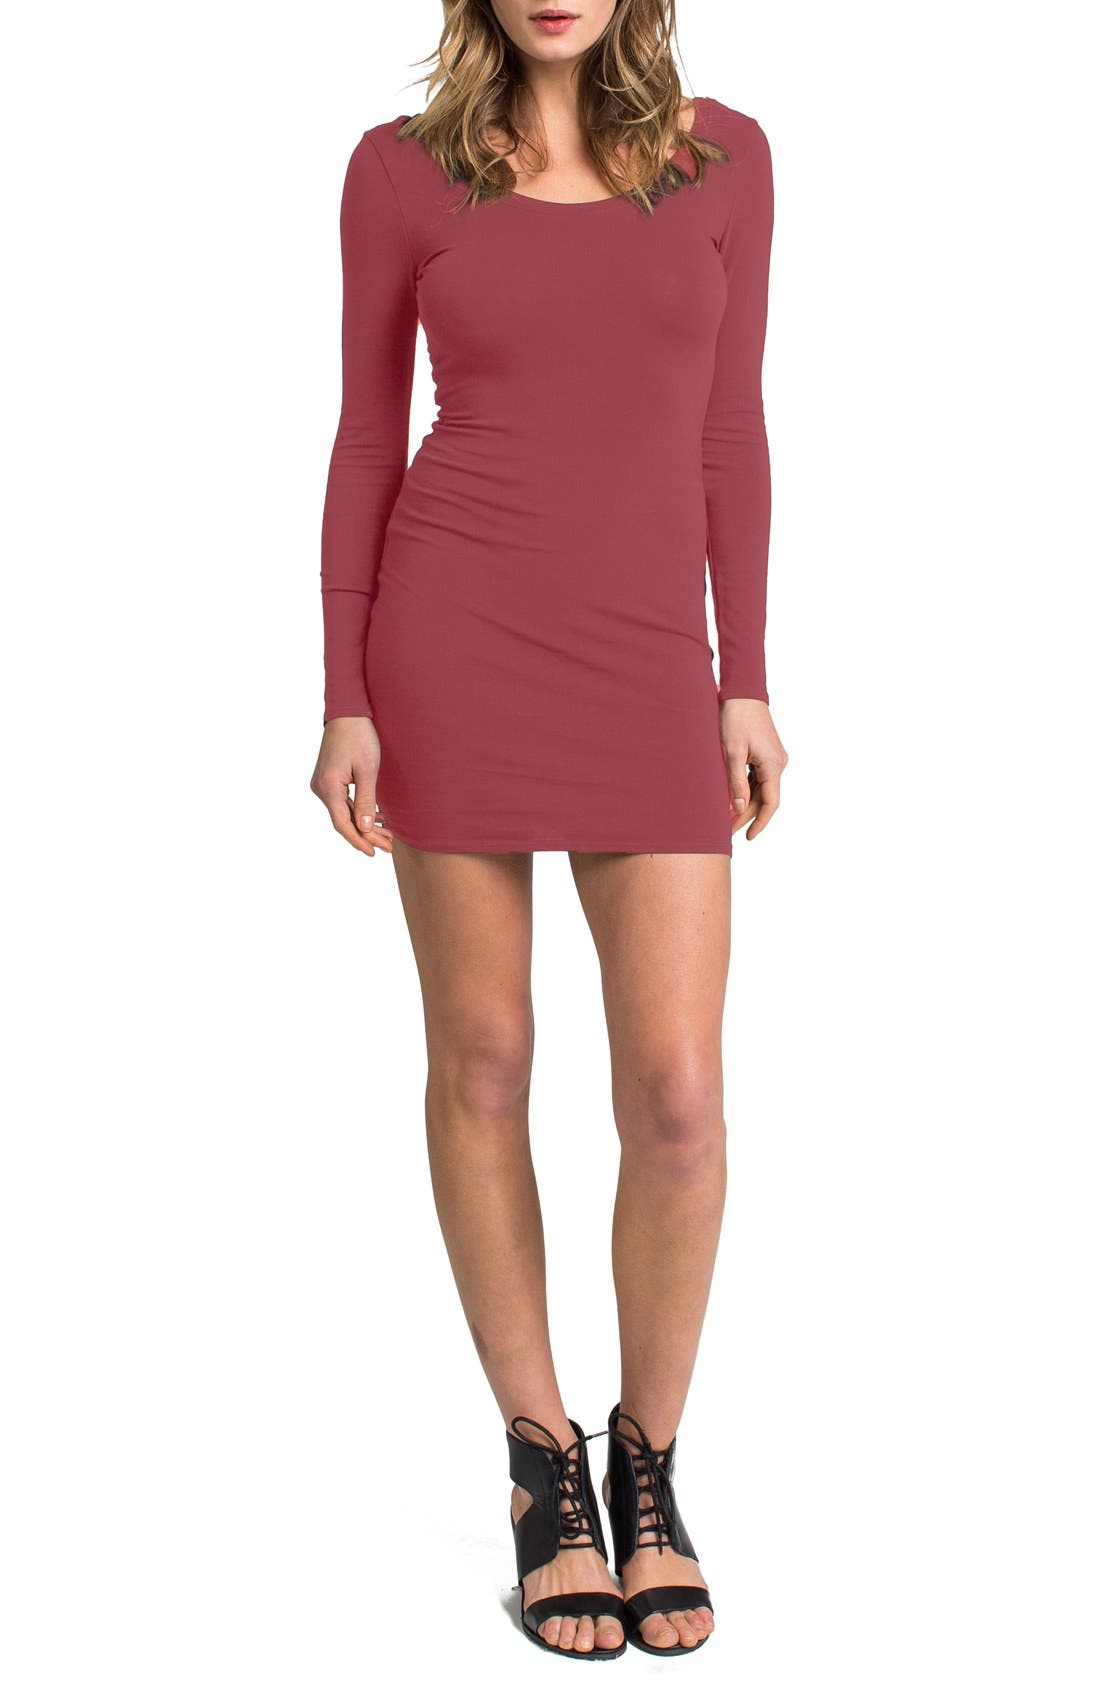 Main Image - LAmade Long Sleeve Knit Body-Con Dress